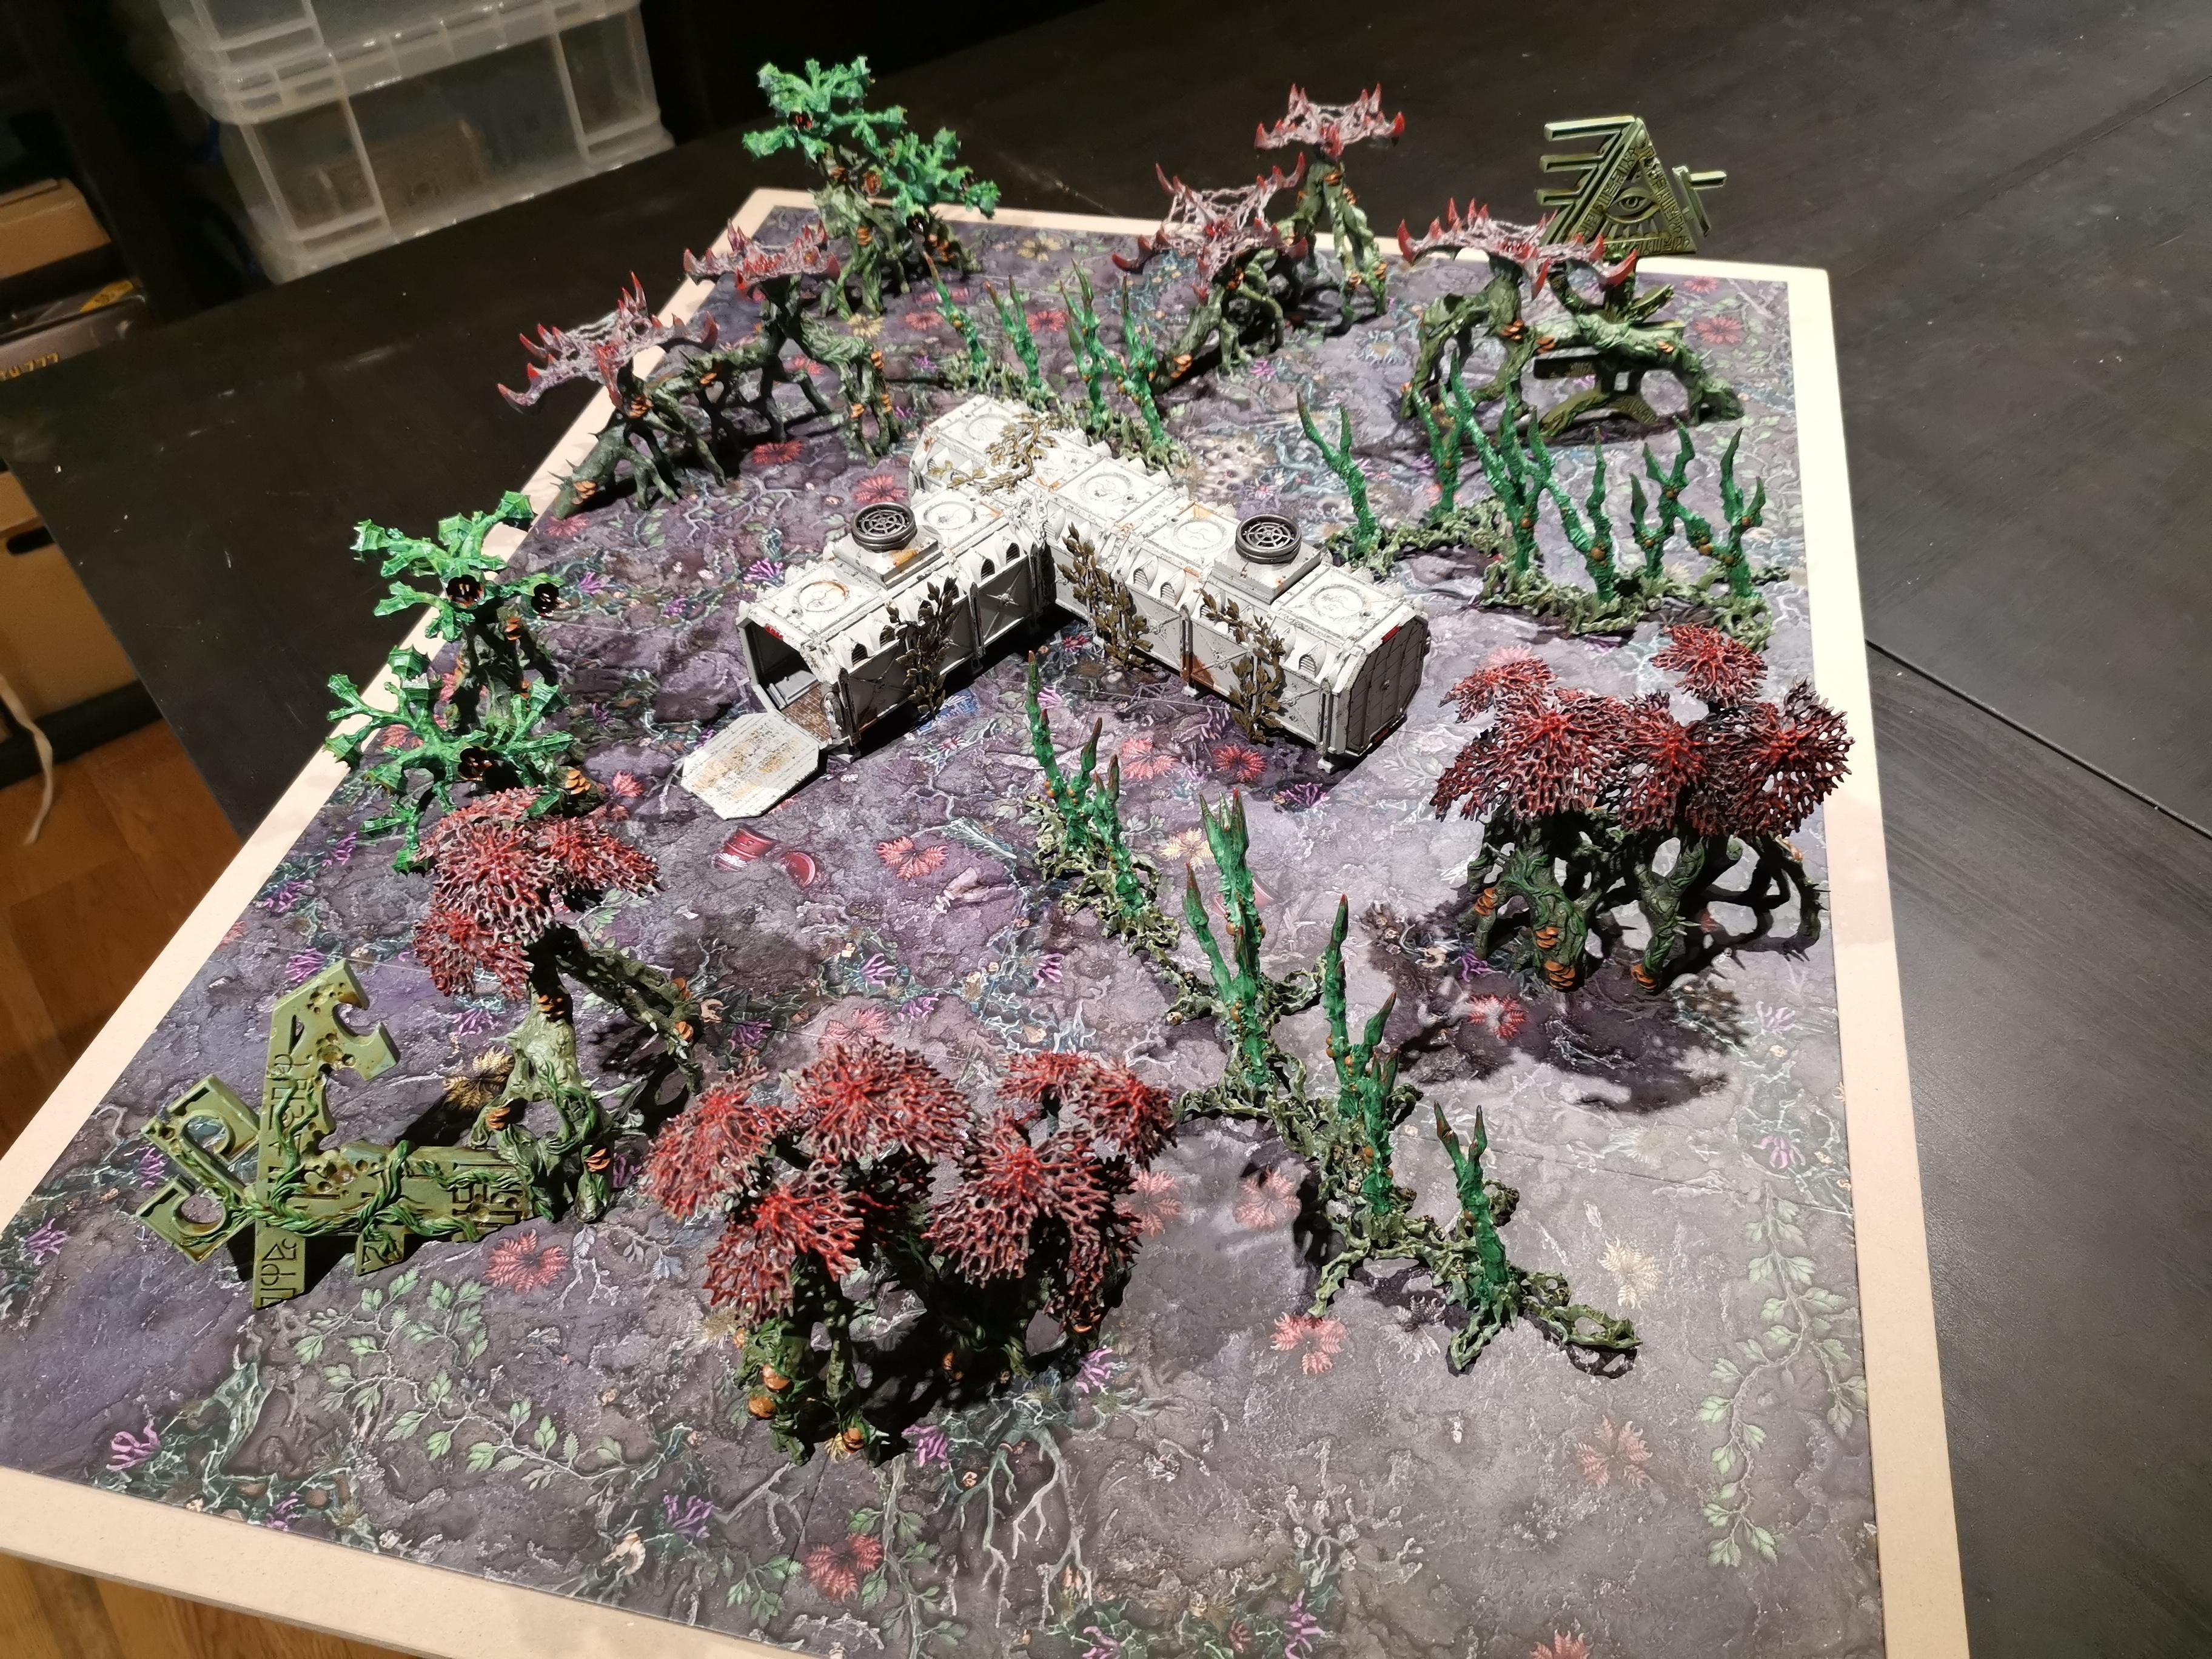 Battlemat, Eldar, Imperium, Jungle, Kill Team, Terrain, Warhammer 40,000, Warhammer Fantasy